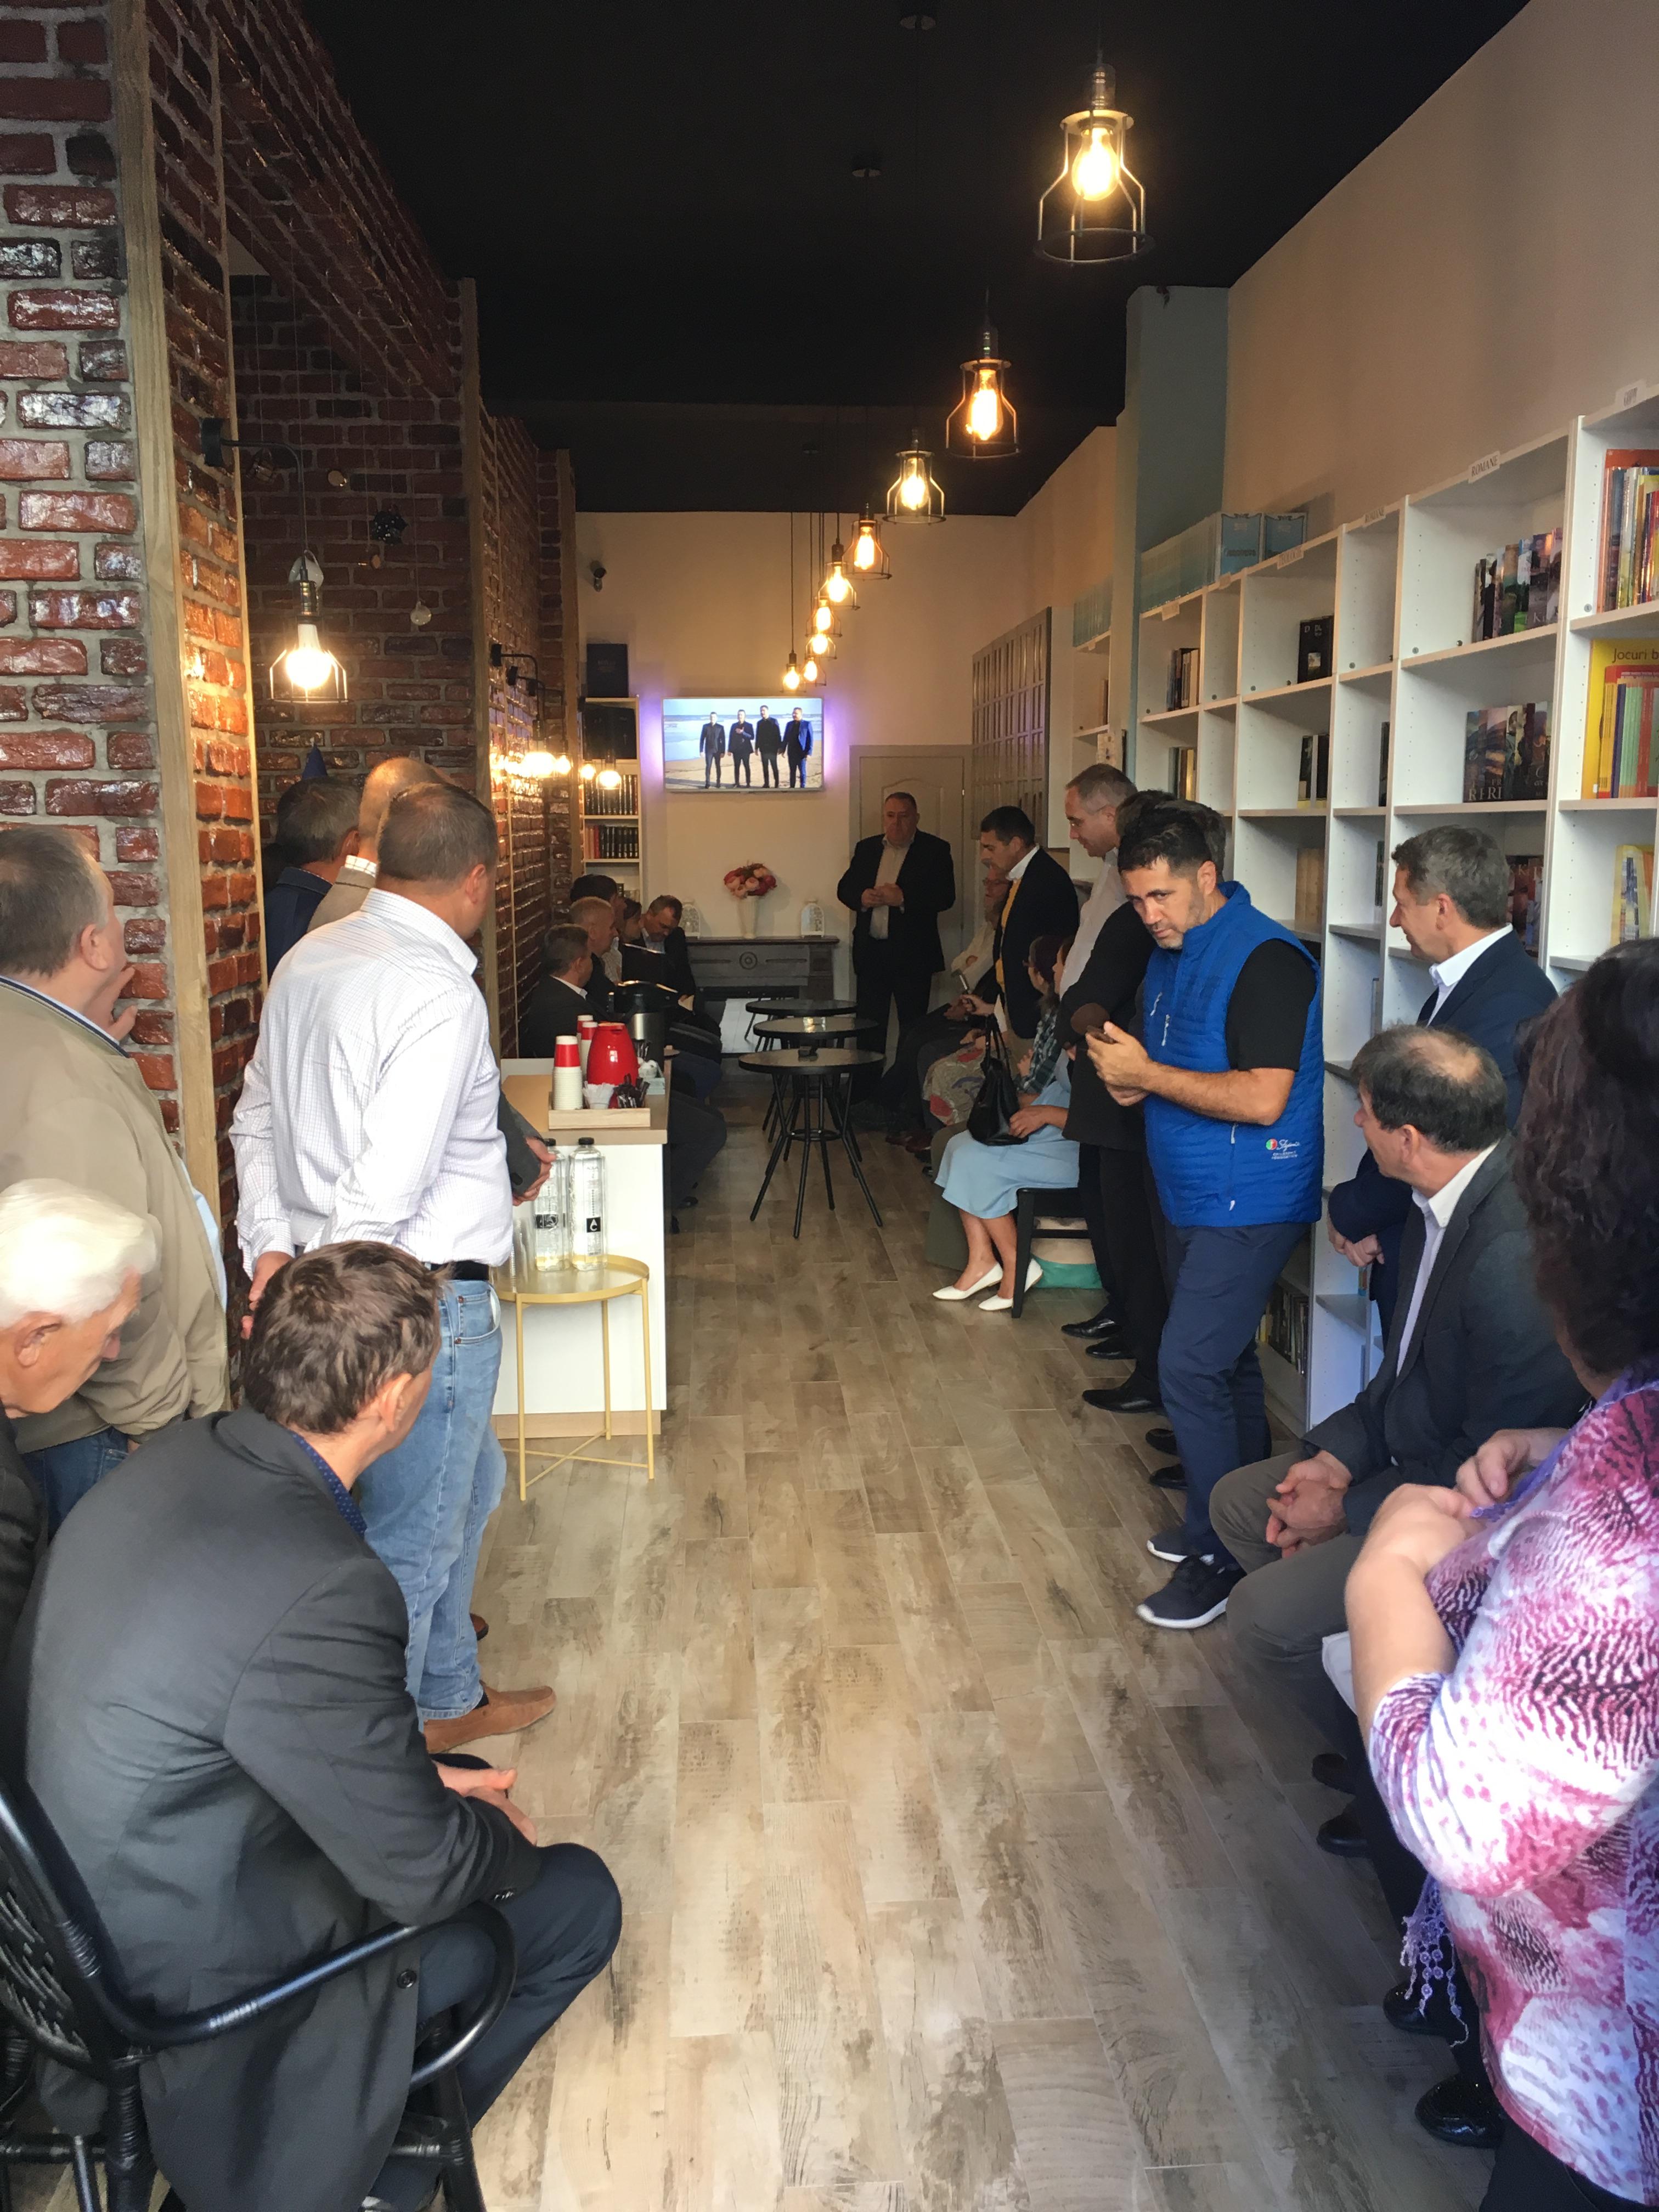 S-a deschis Coffee BookShop Logos la Suceava — Suceava Evanghelica